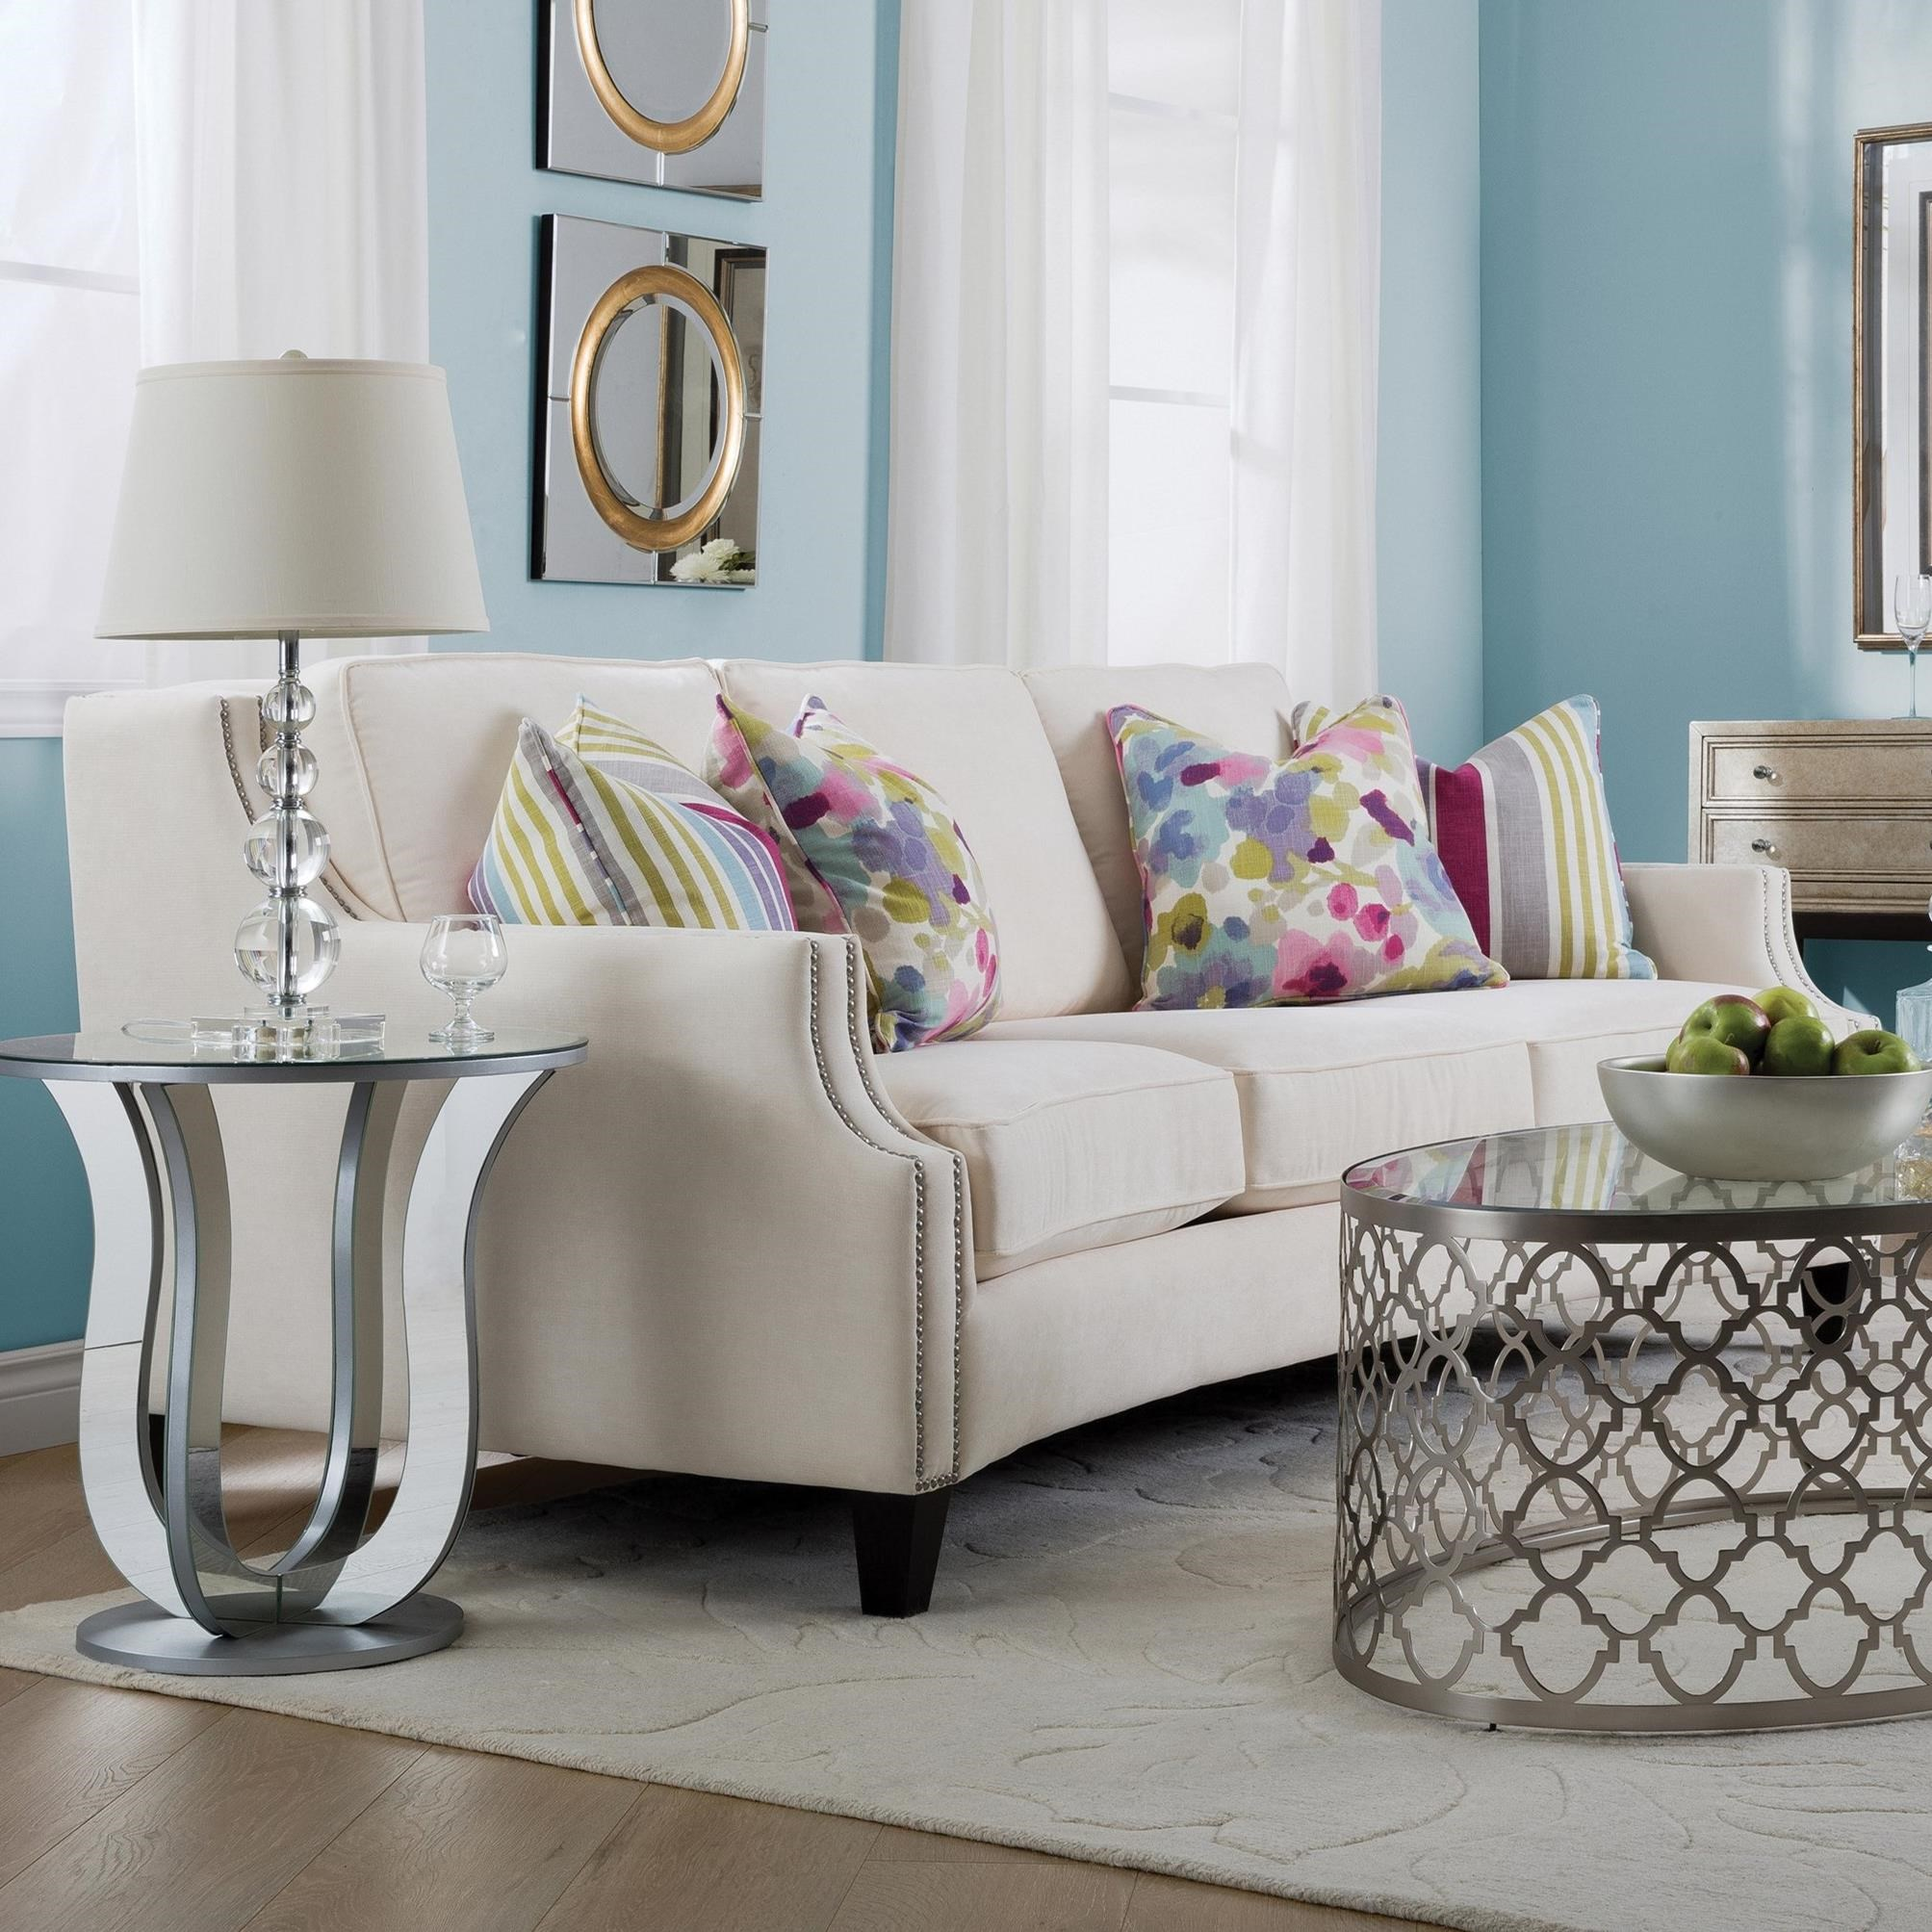 Coulters Decor-Rest Furniture A in furniture manufacturing